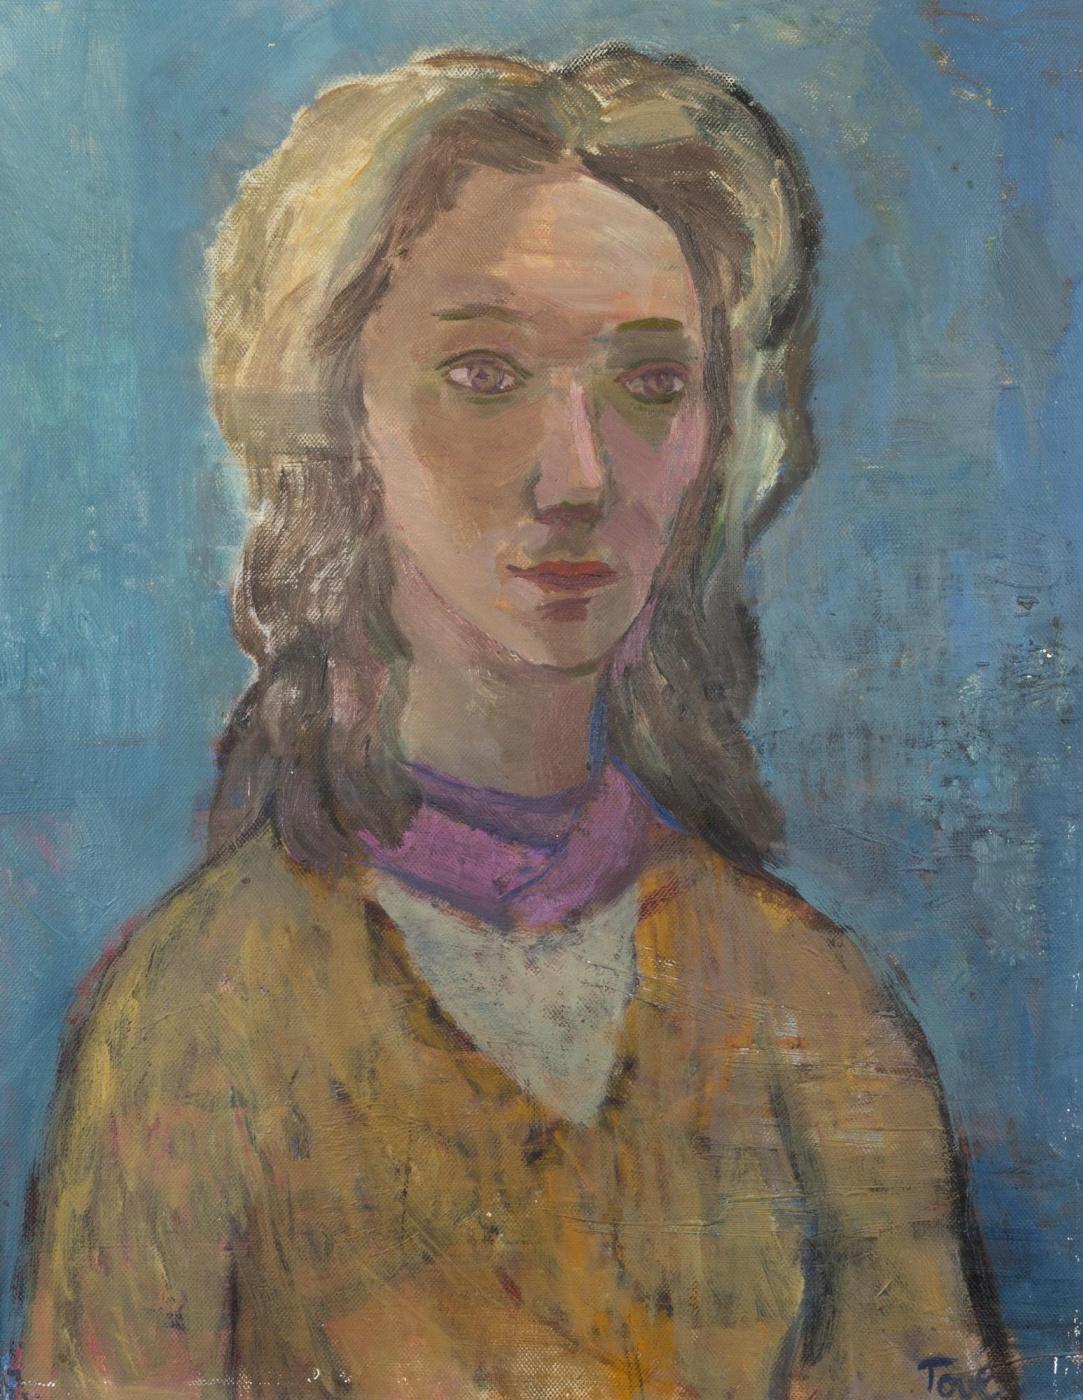 Tove Jansson. Portrait of a young woman